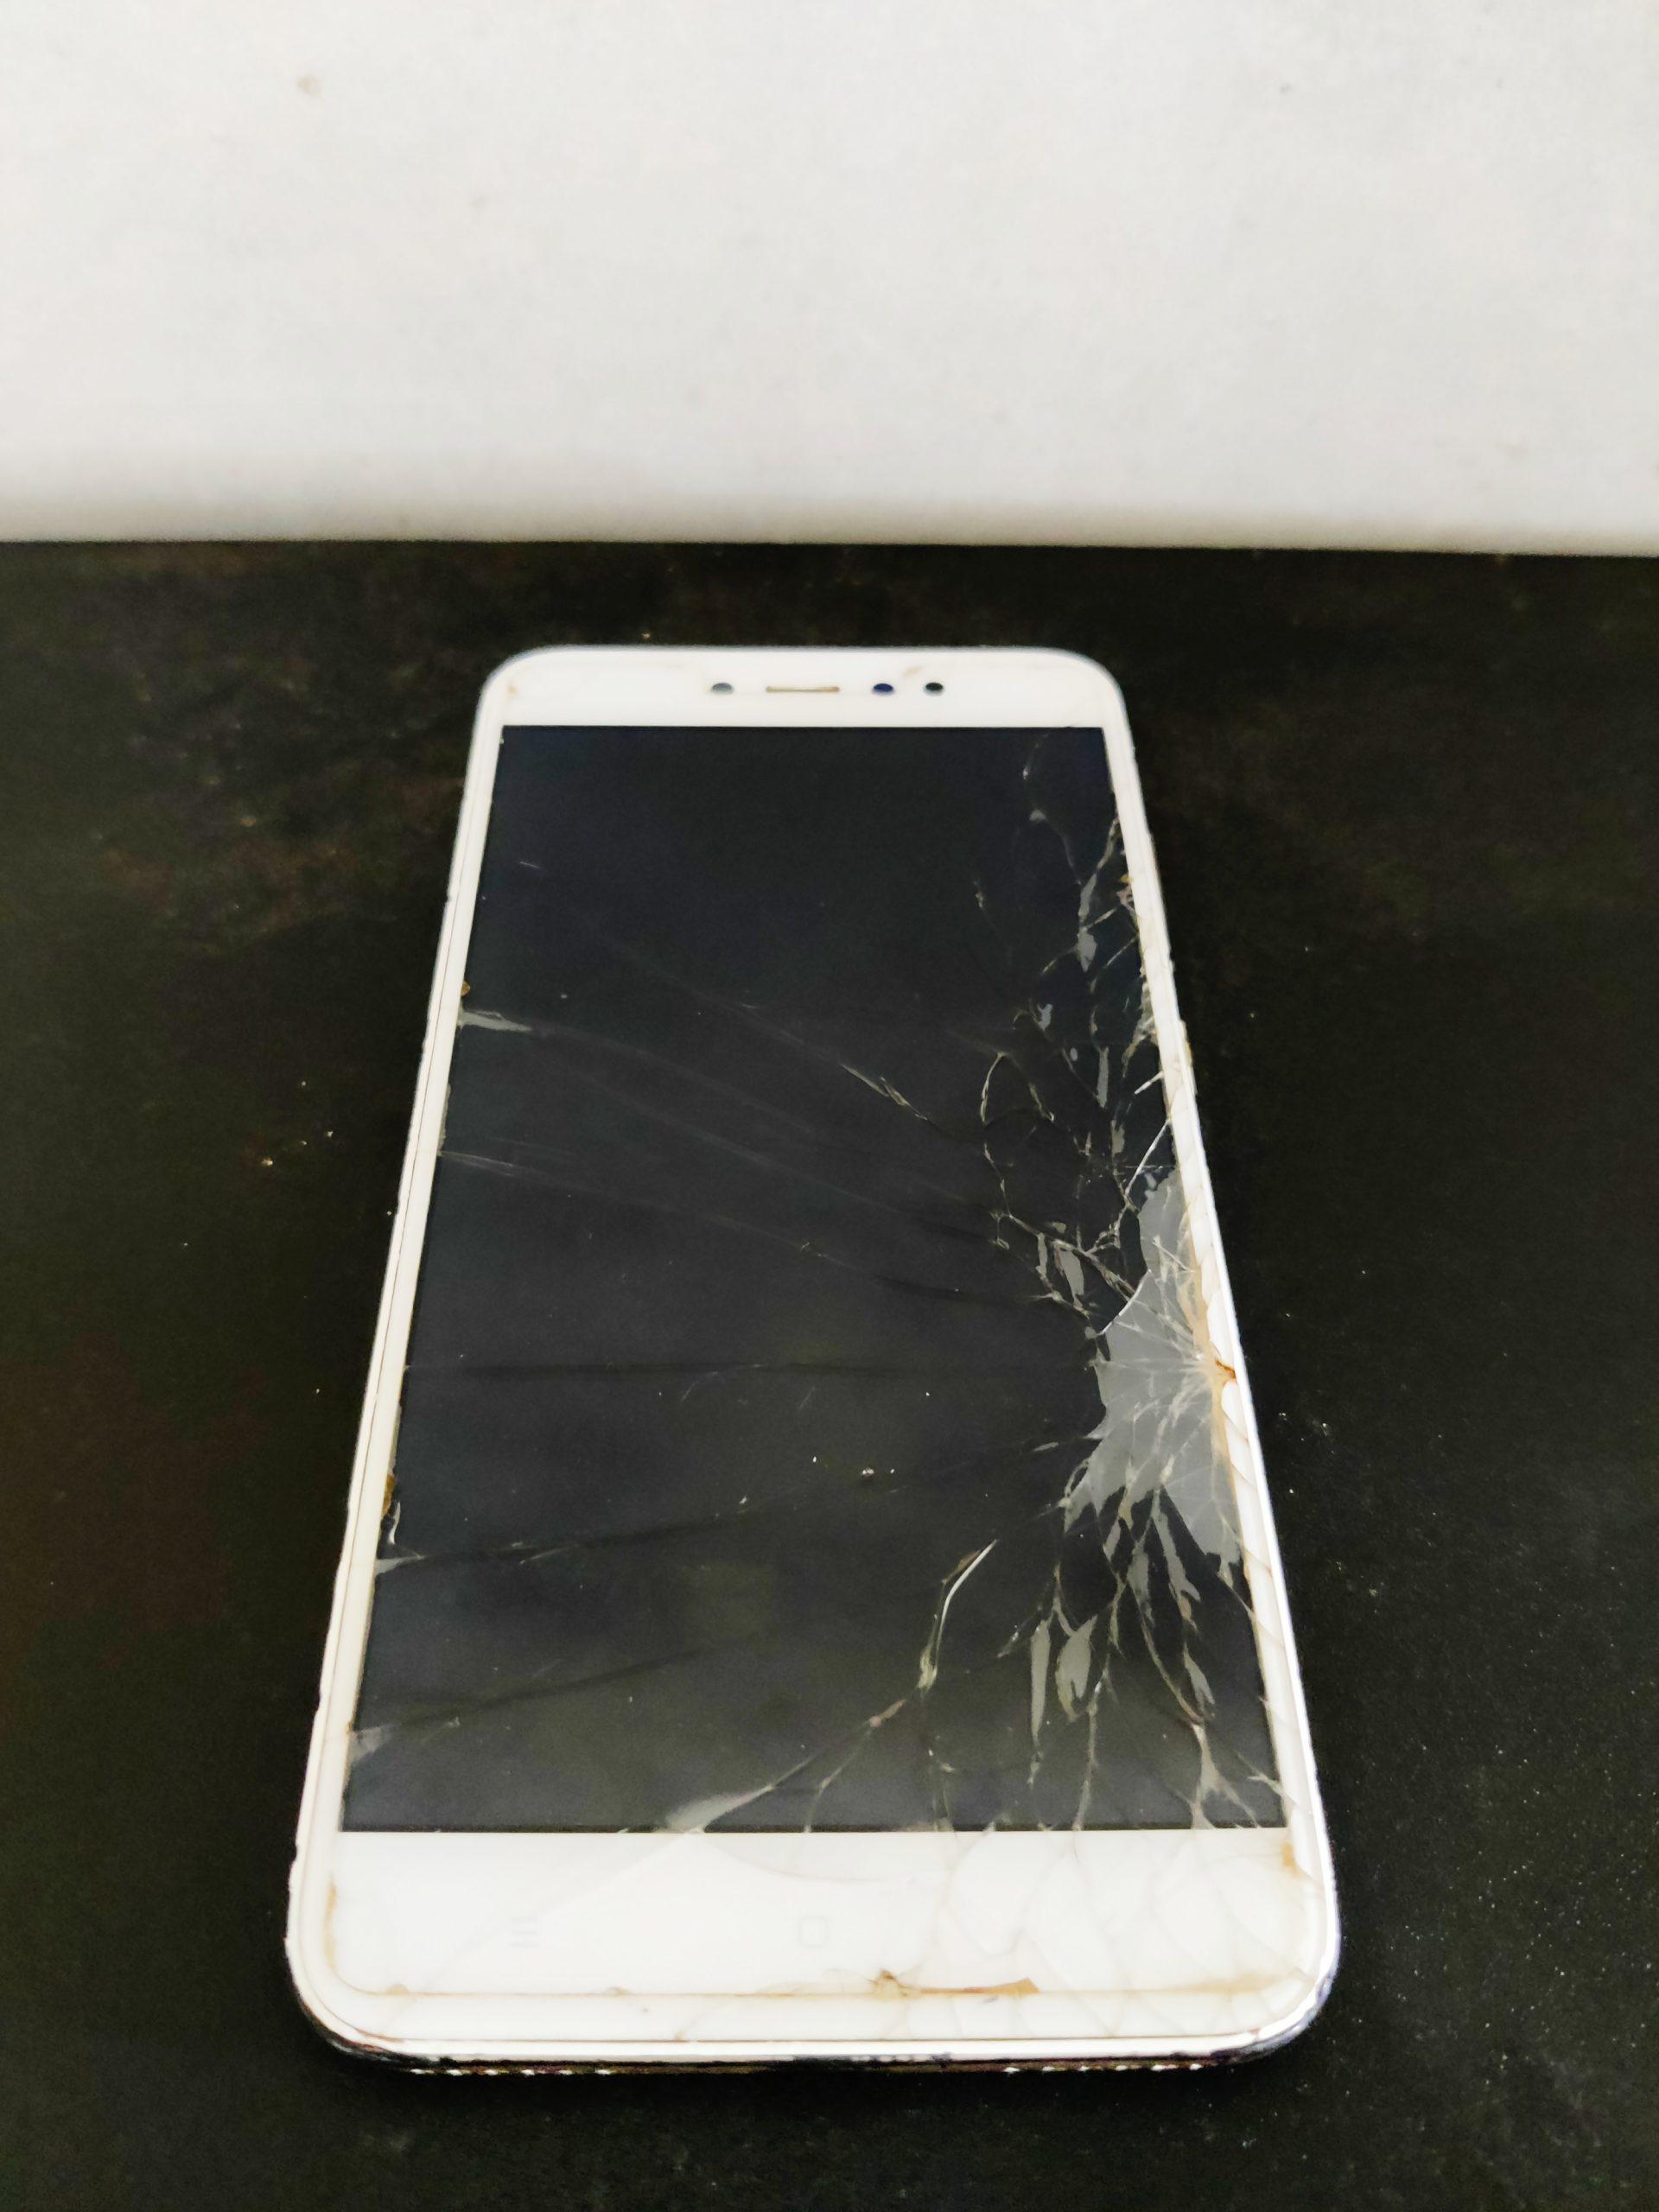 Broken screen of mobile